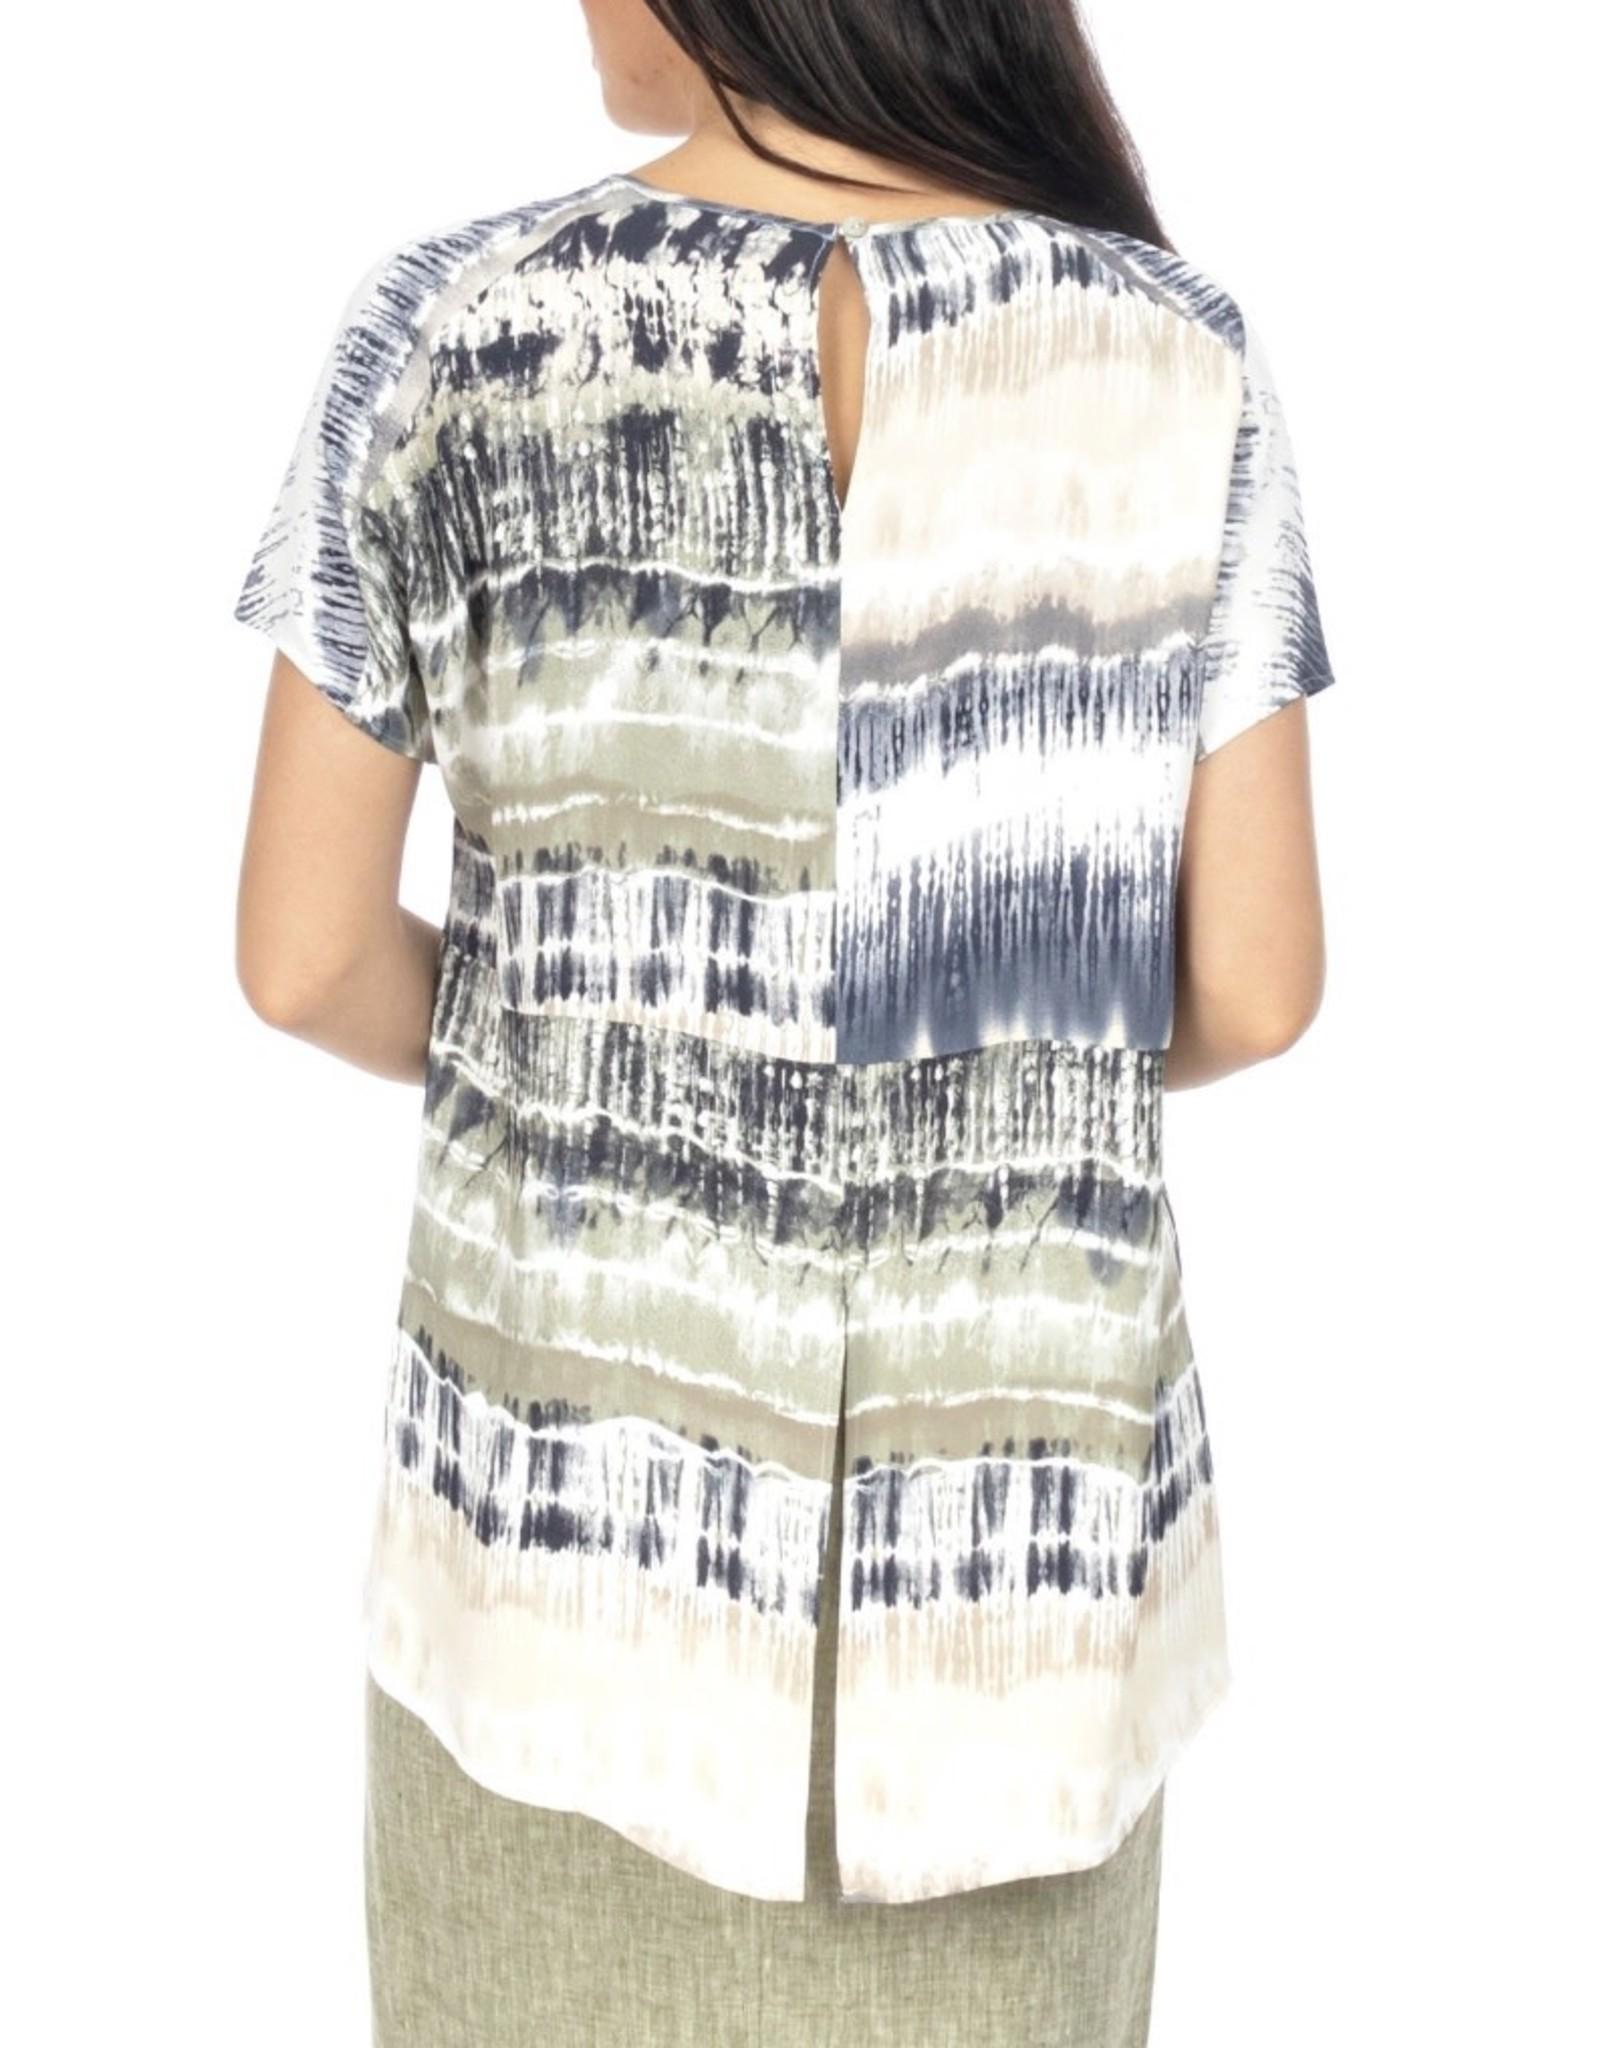 Ping Pong Ping Pong - Drop Shoulder Tye Dyed Top